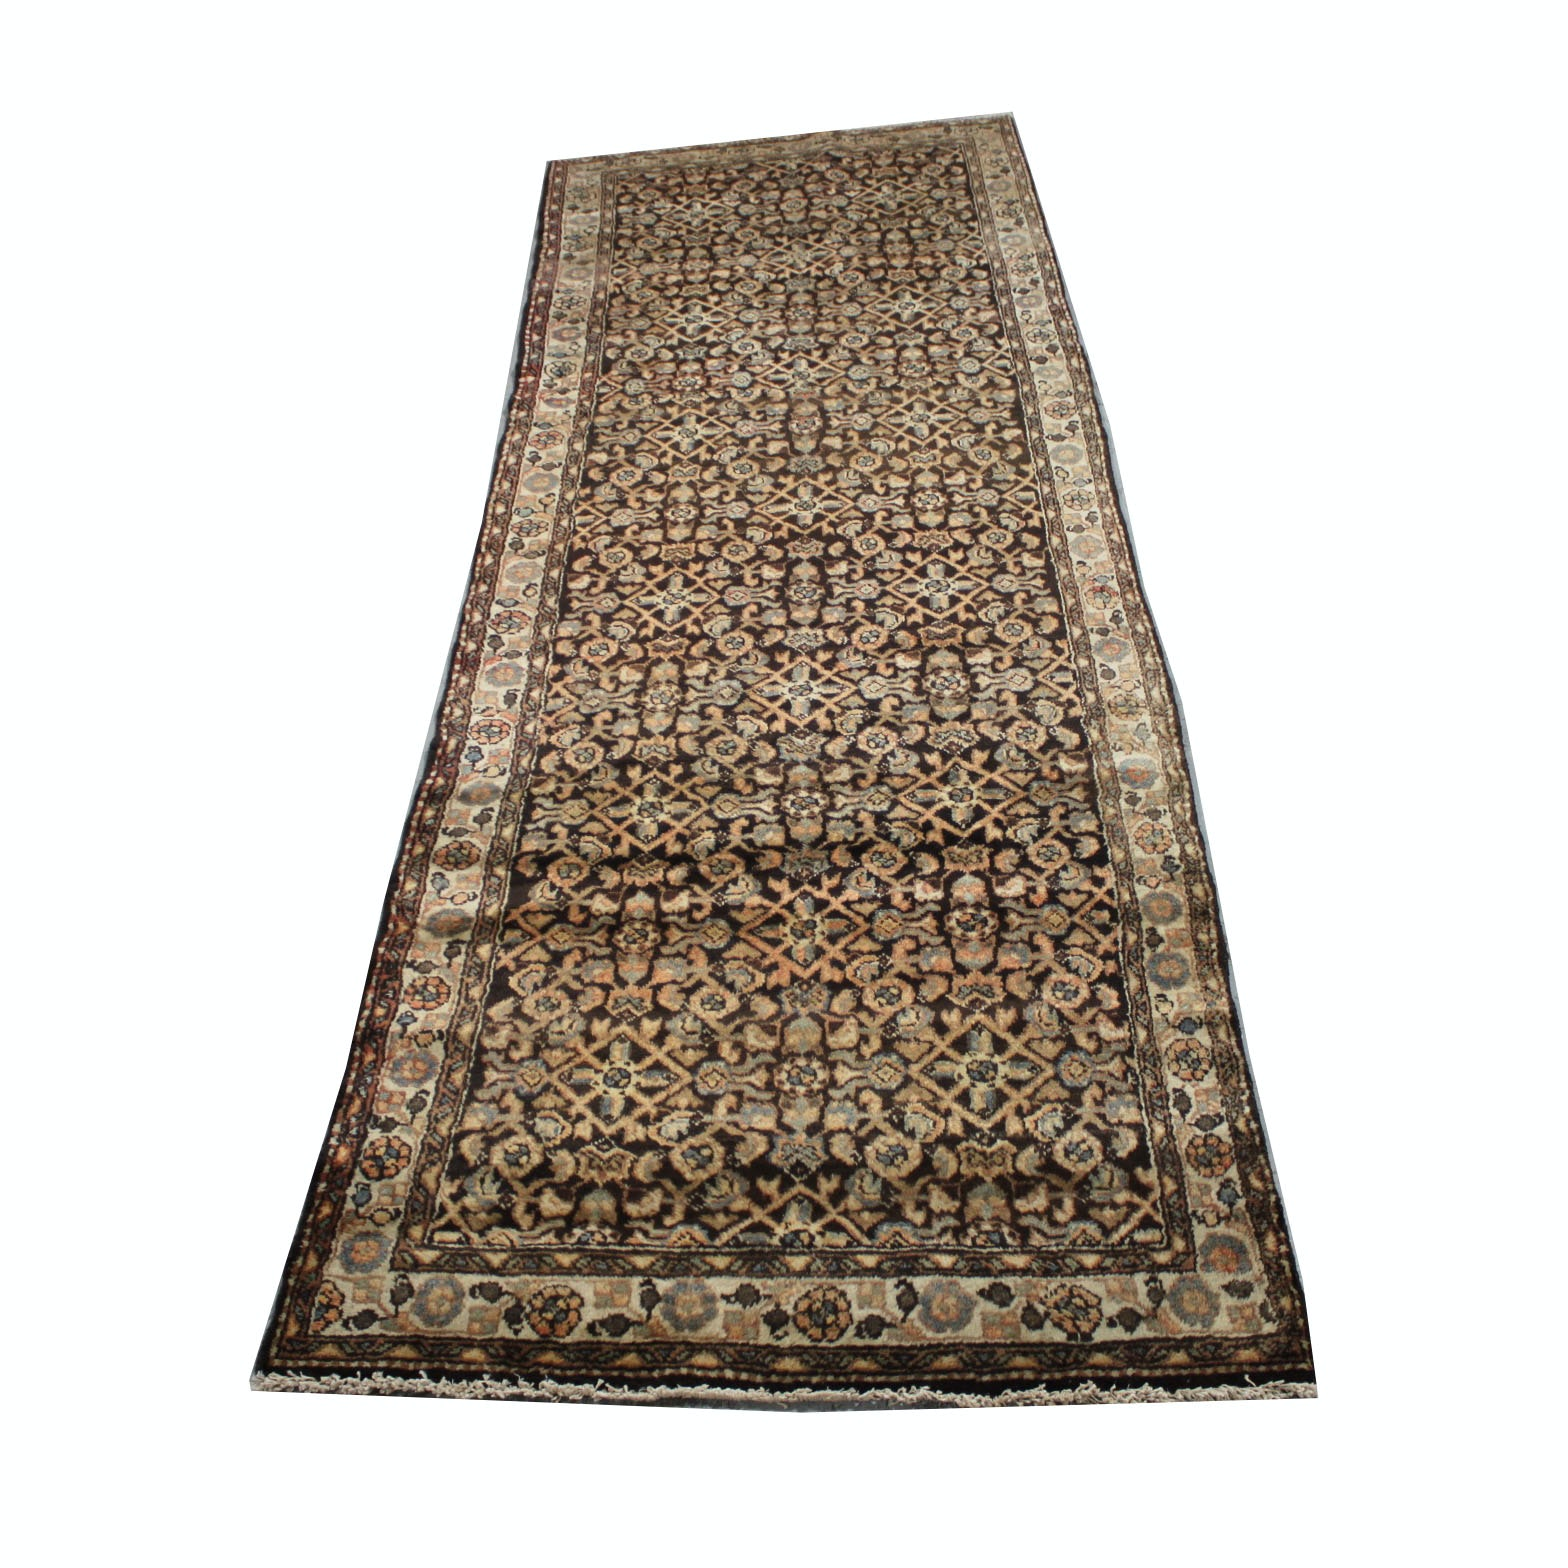 Vintage Hand-Knotted Persian Lilihan Wool Carpet Runner